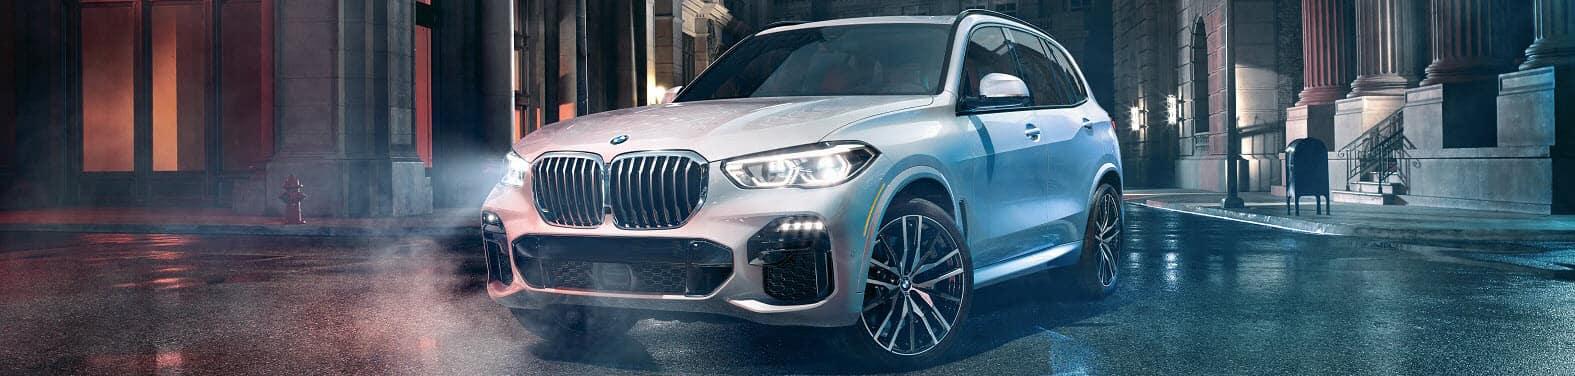 BMW X5 MPG